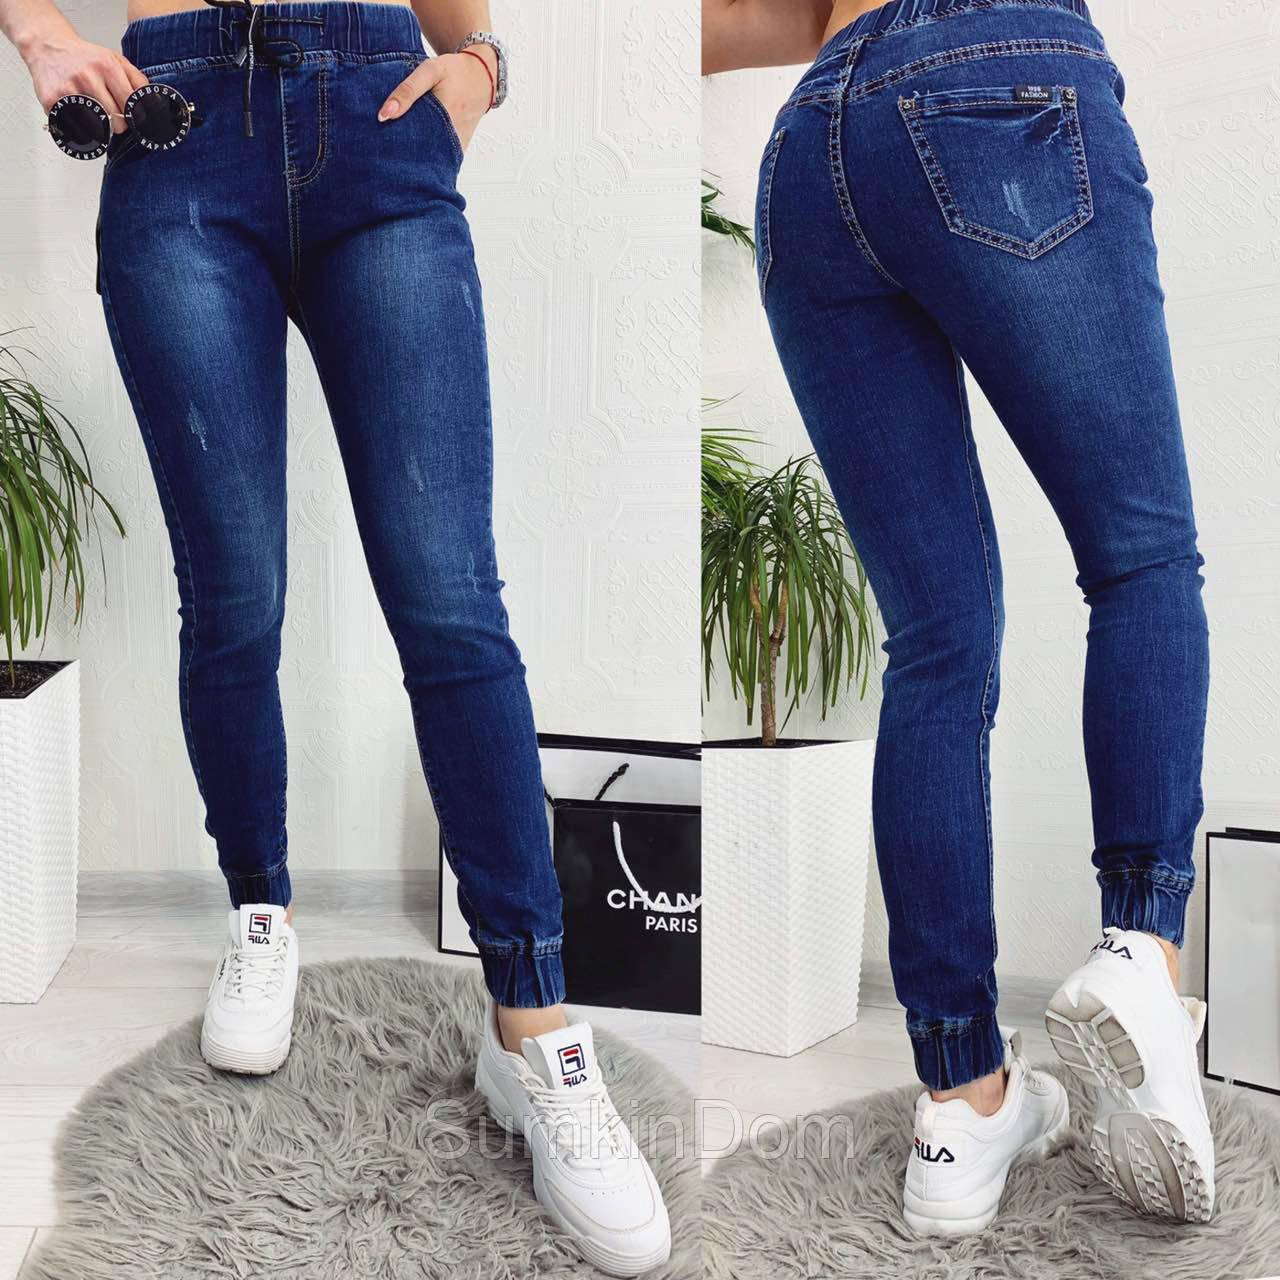 Джинсы женские на резинке с царапками ( 1944 New jeans )